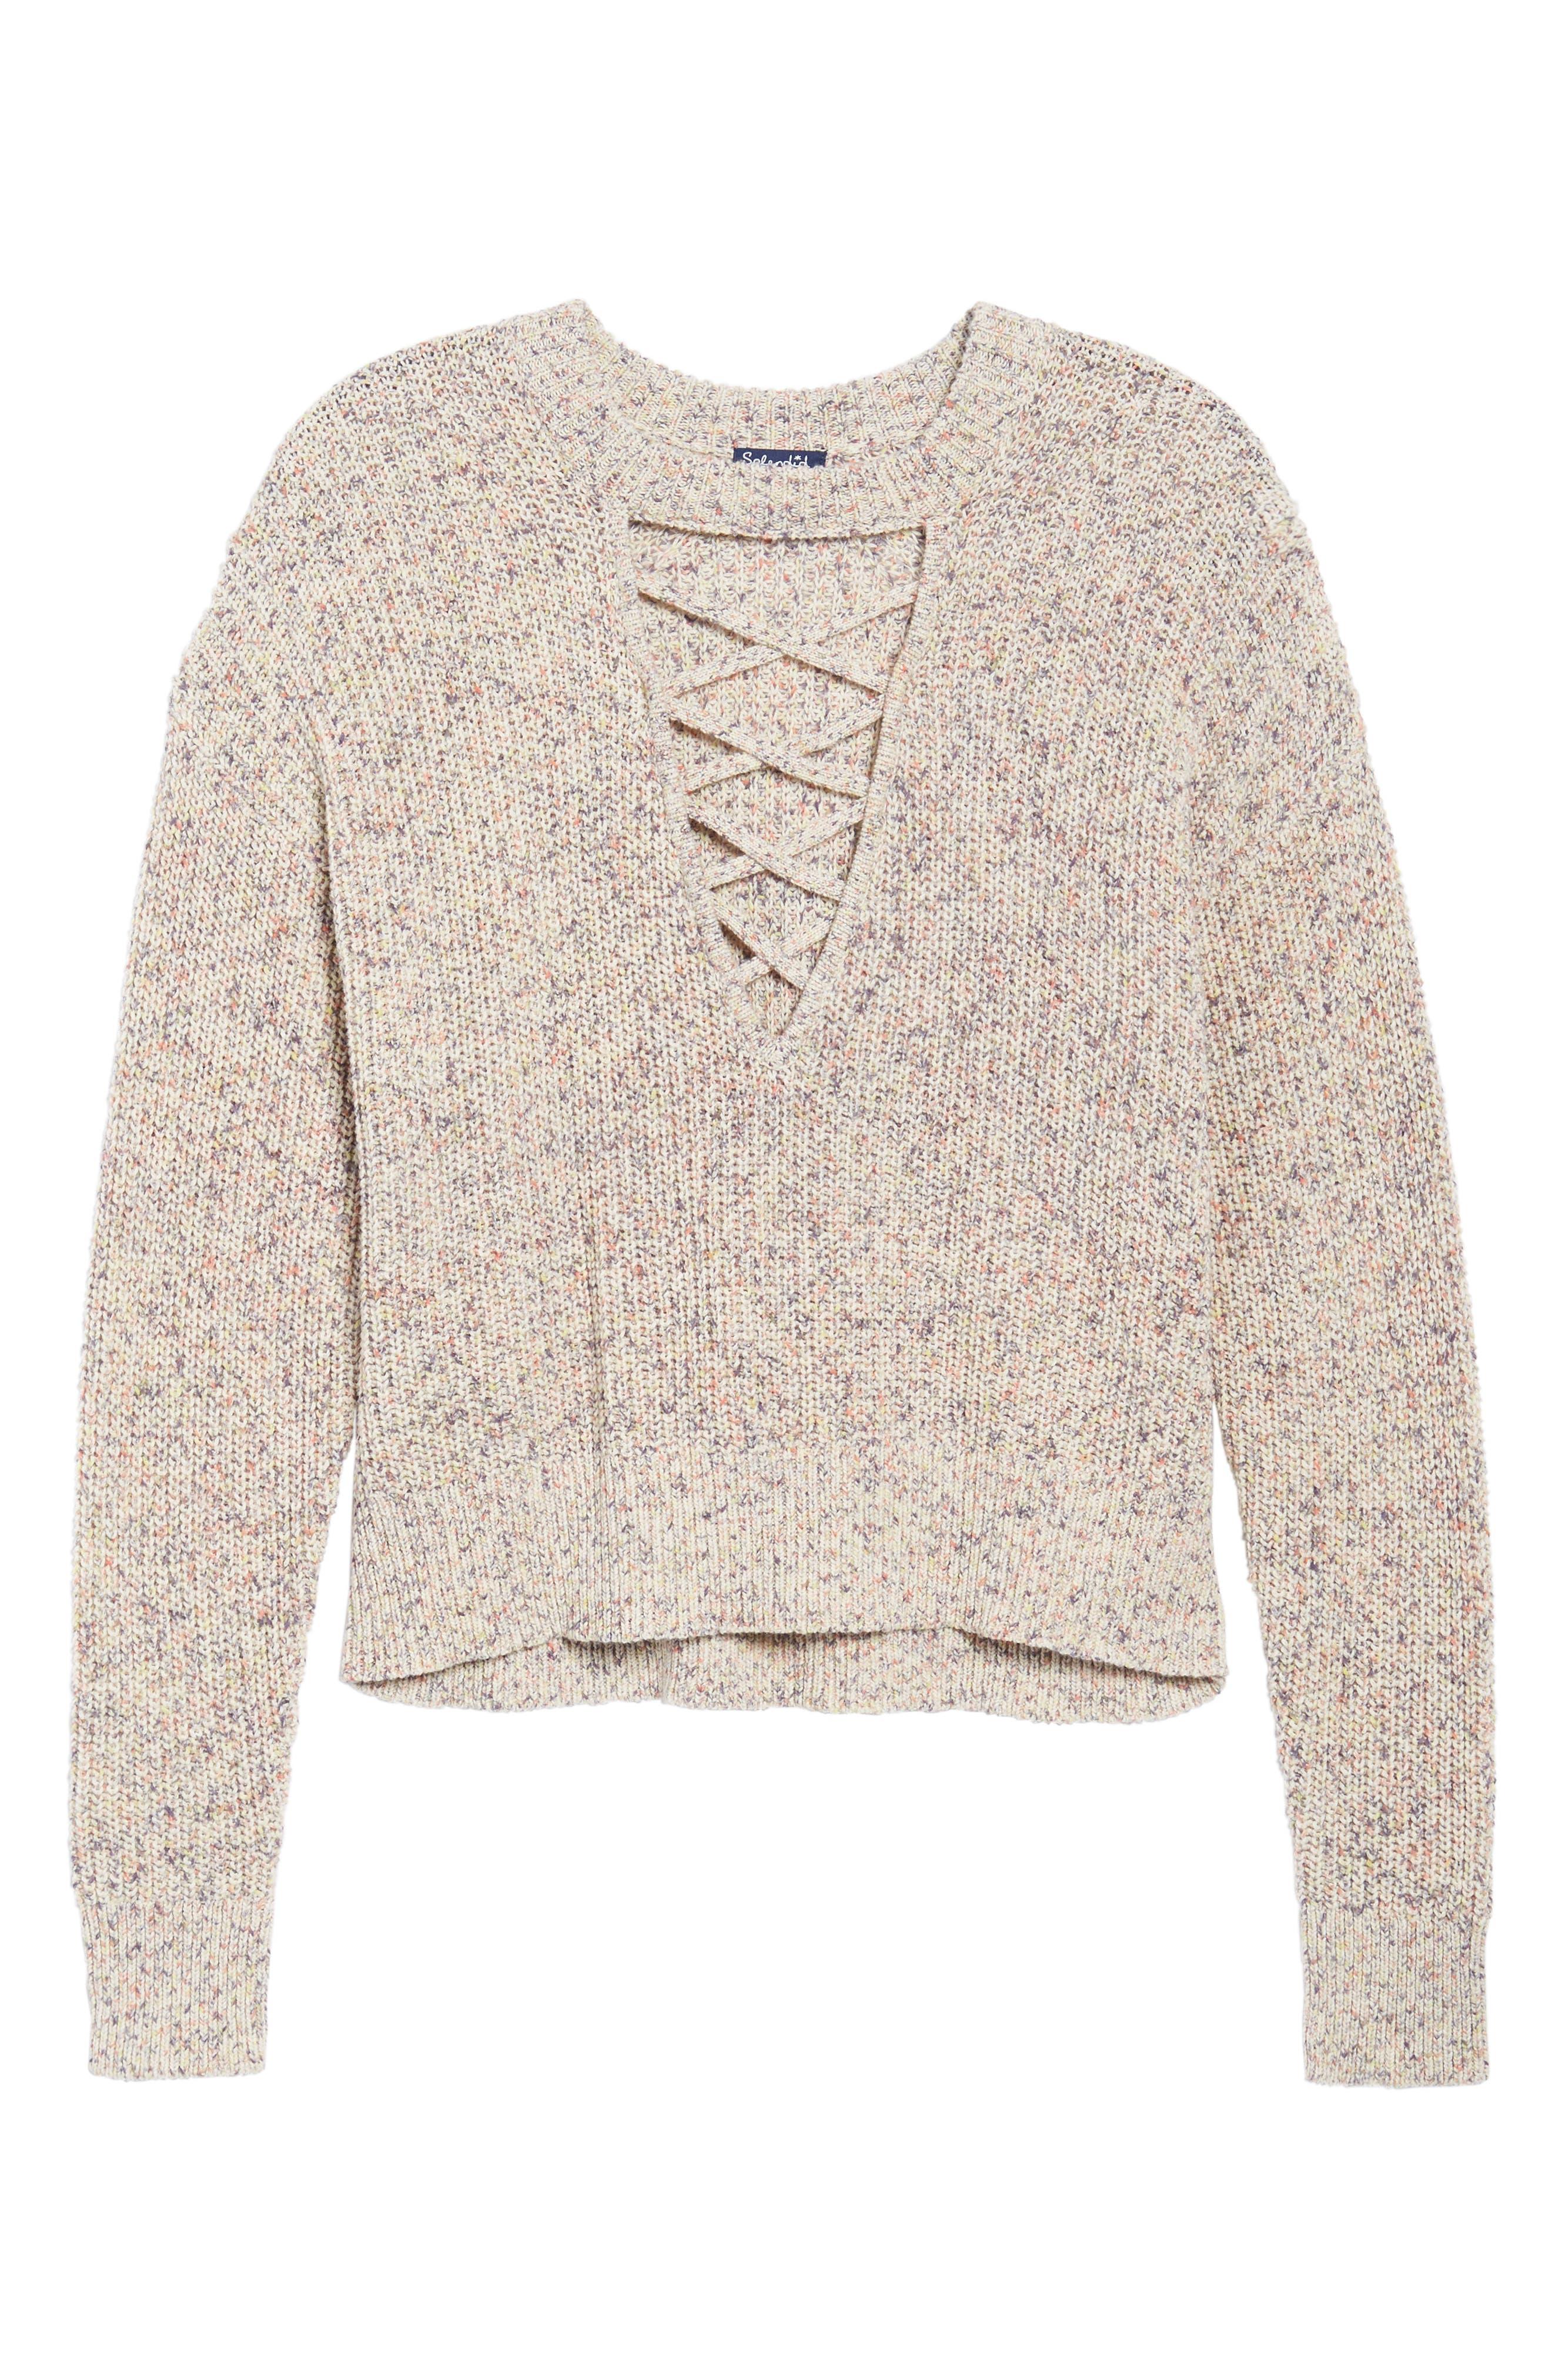 Plunging Crisscross Sweater,                             Alternate thumbnail 7, color,                             Glow Multi